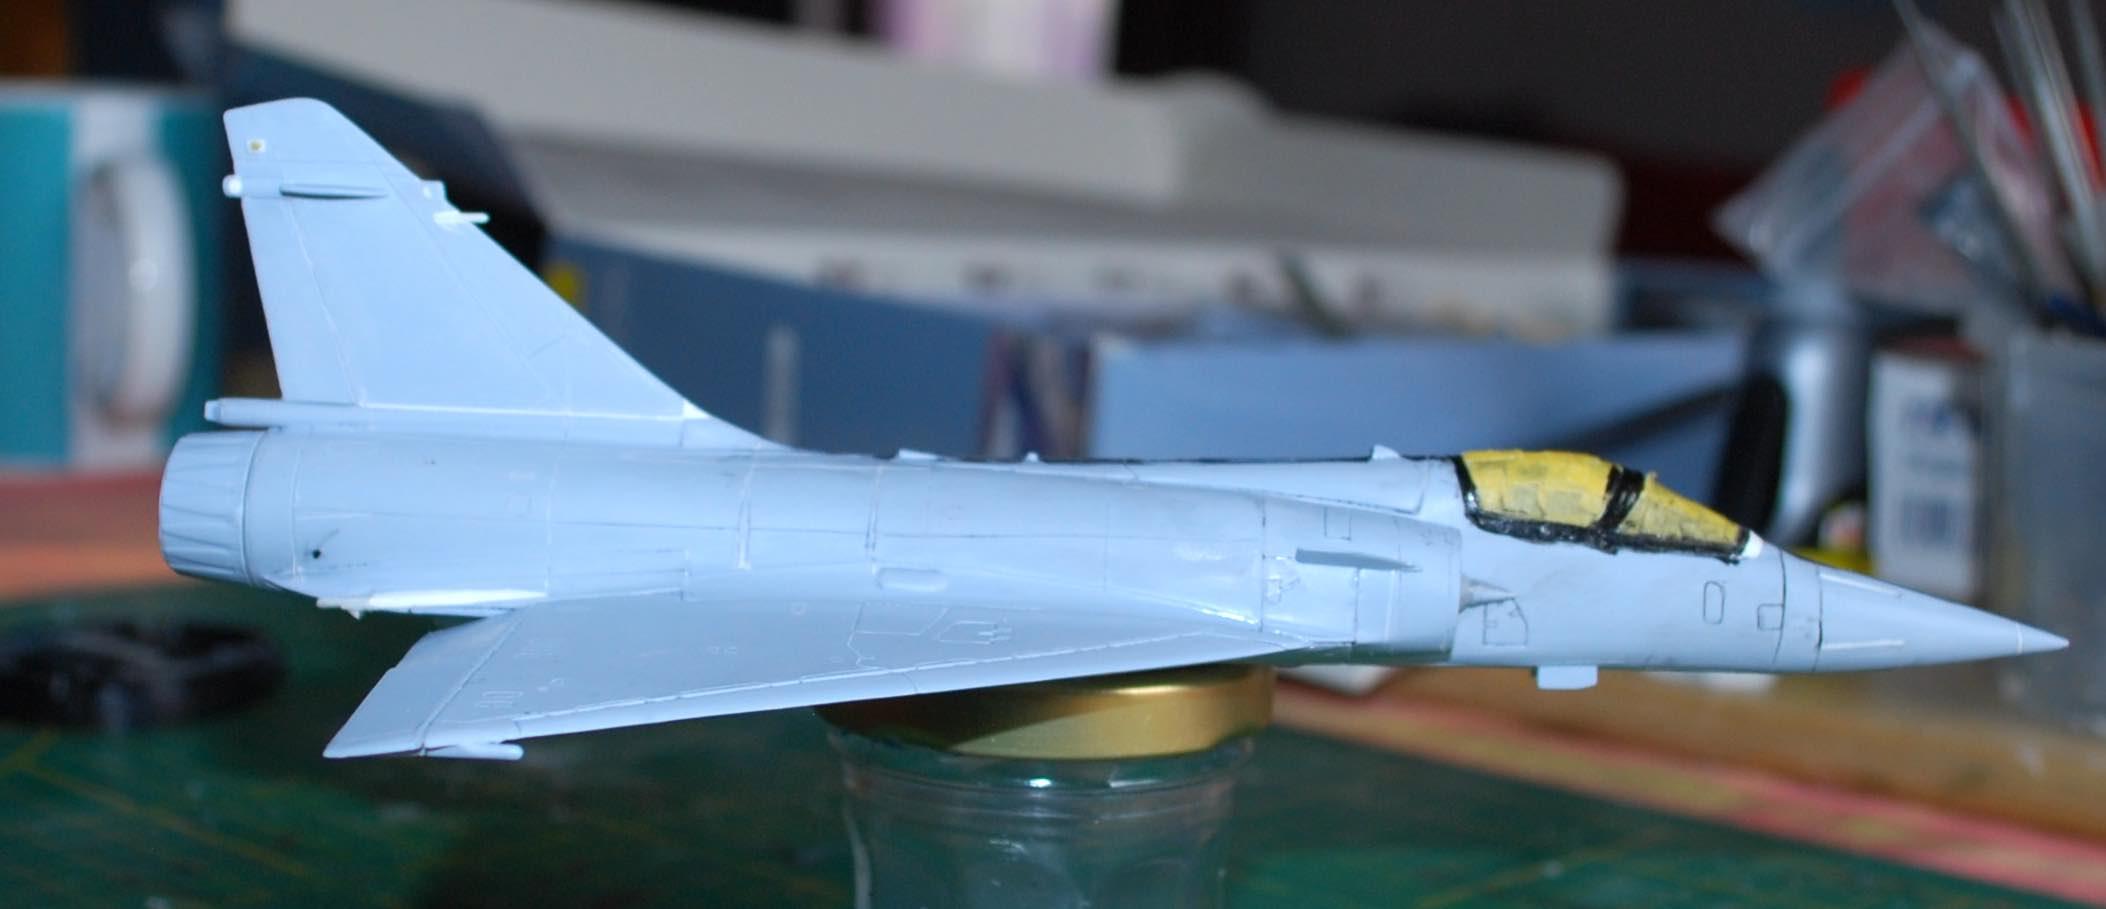 1/72 Mirage 2000-5F (Base 2000C) Heller Dsc_0302